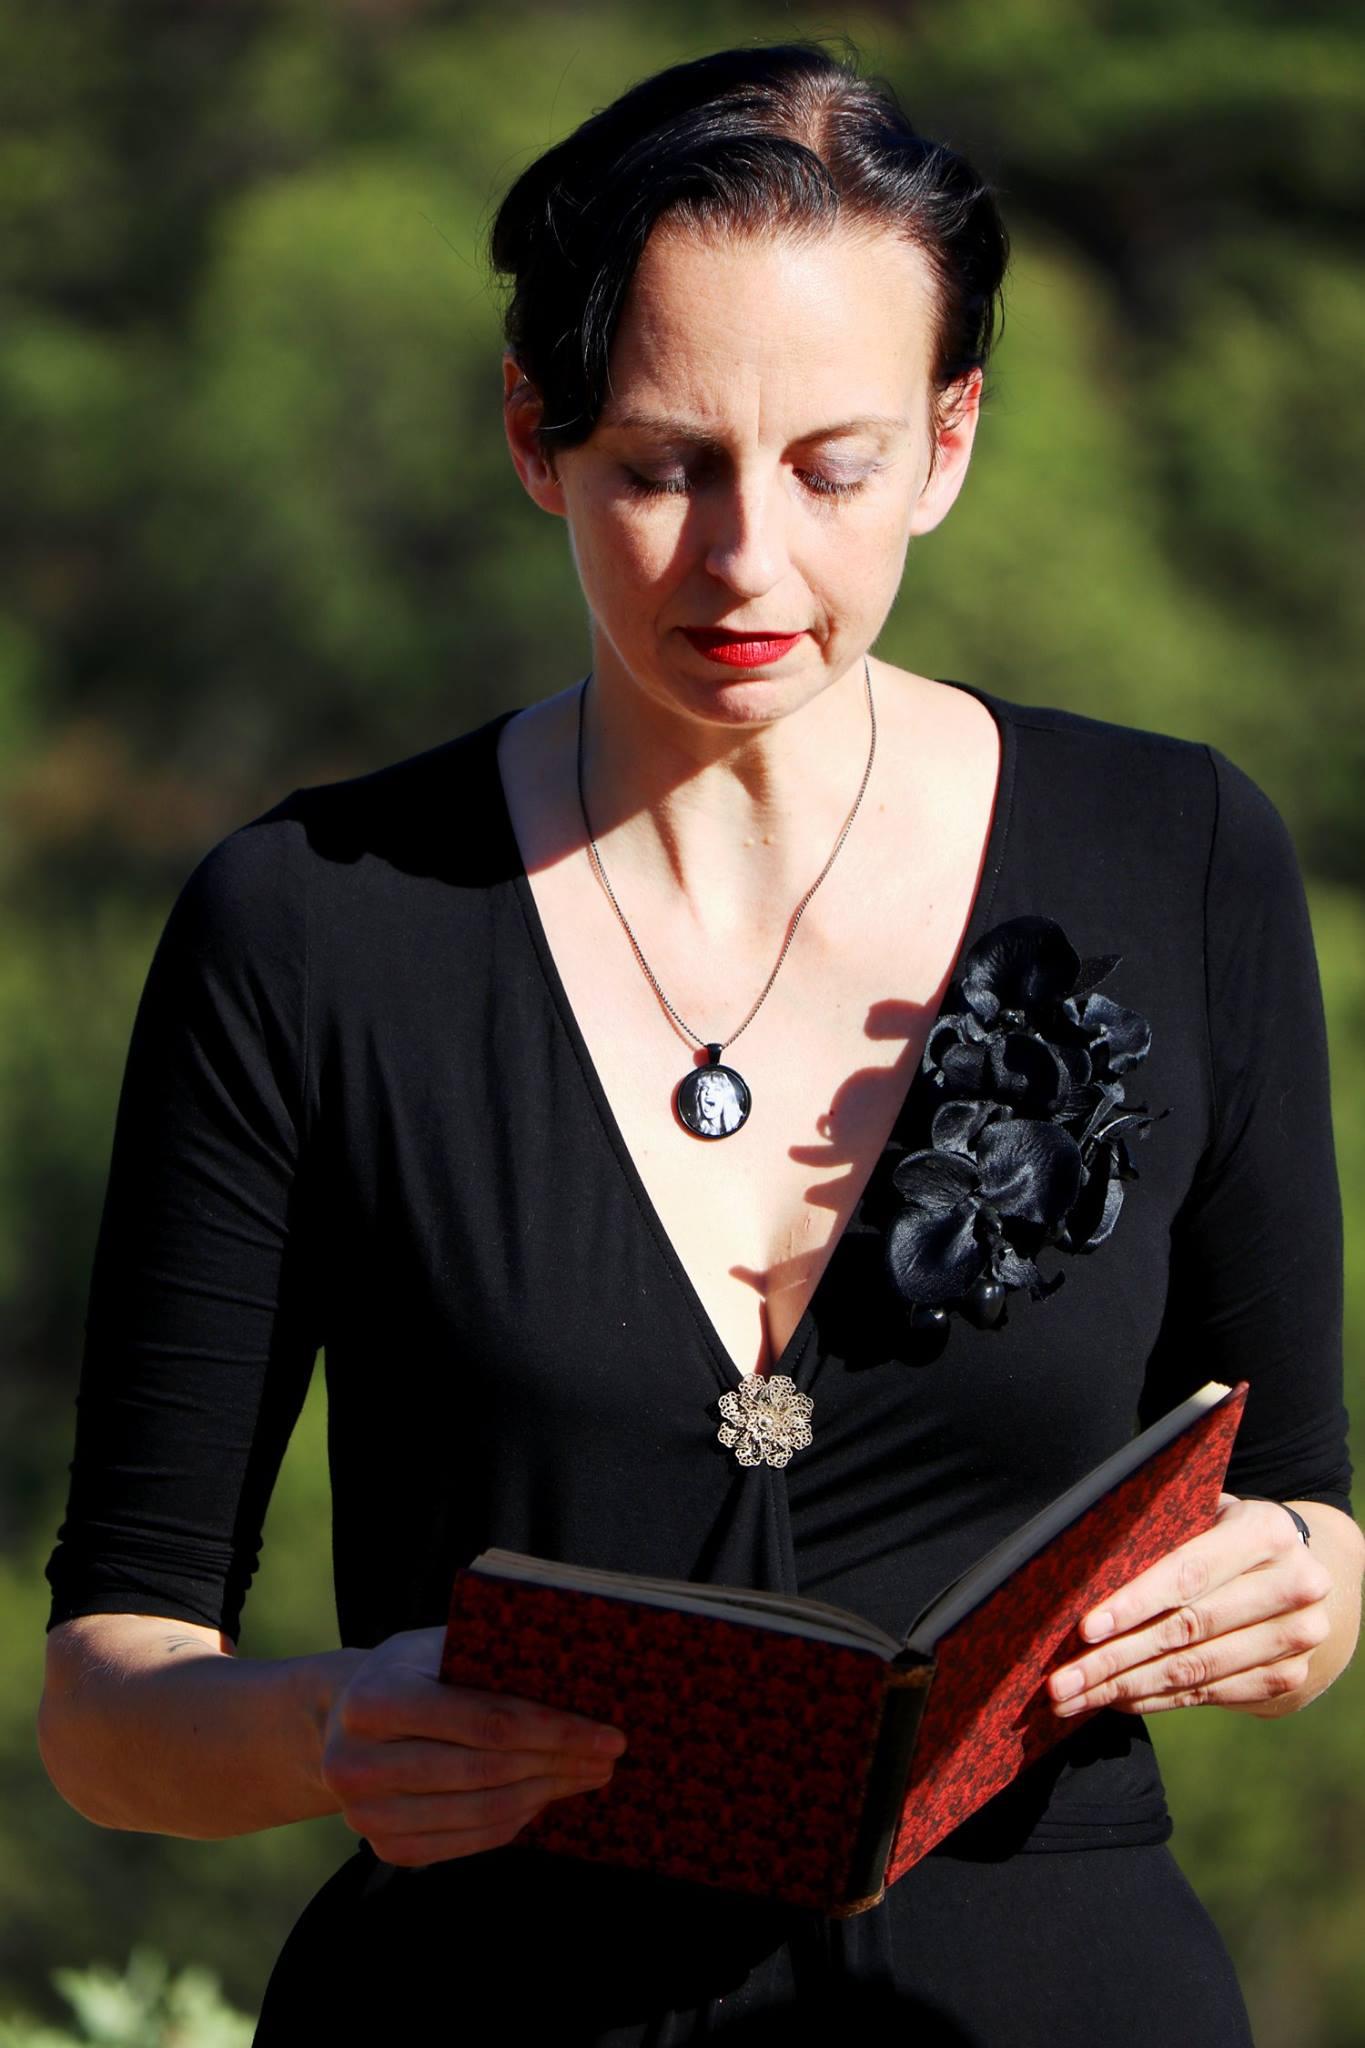 Sarah Houghton